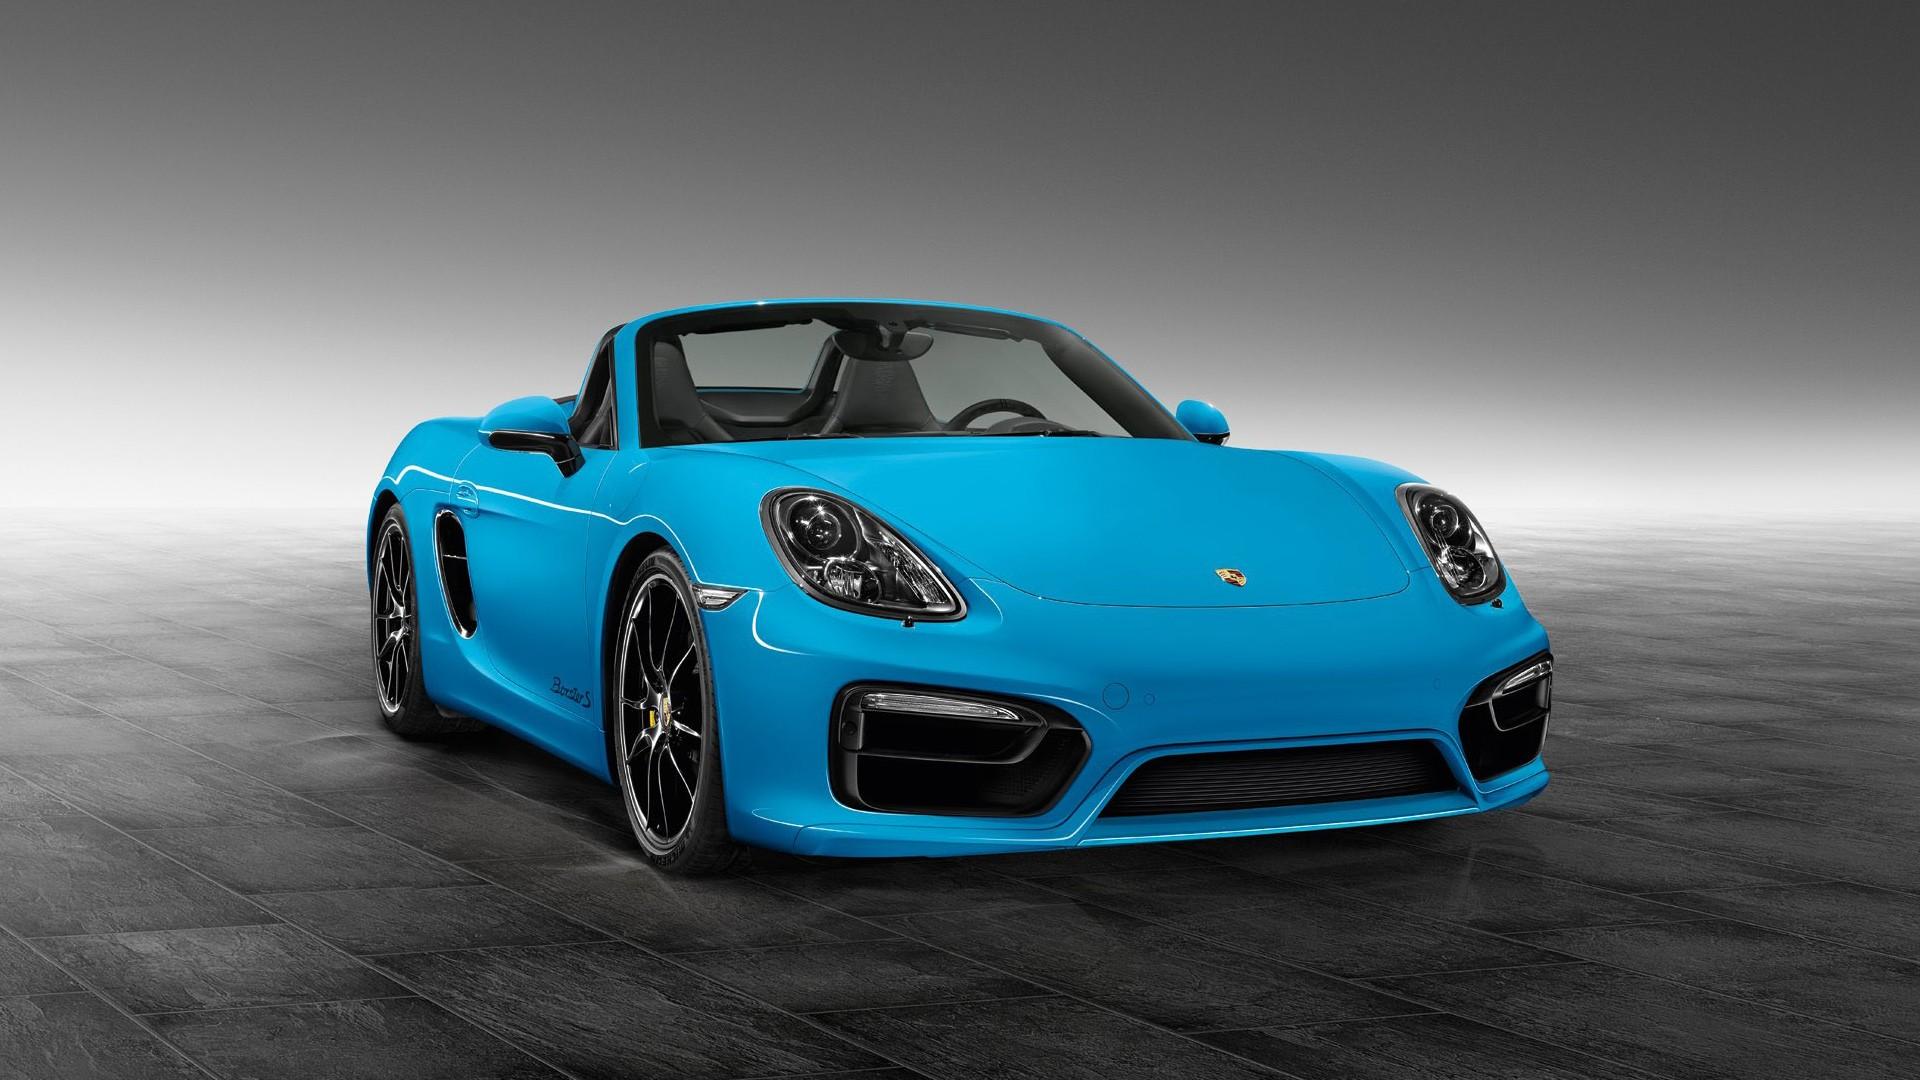 4k Car Wallpaper Koenigsegg Rs 2014 Porsche Exclusive Bespoke Boxster S Wallpaper Hd